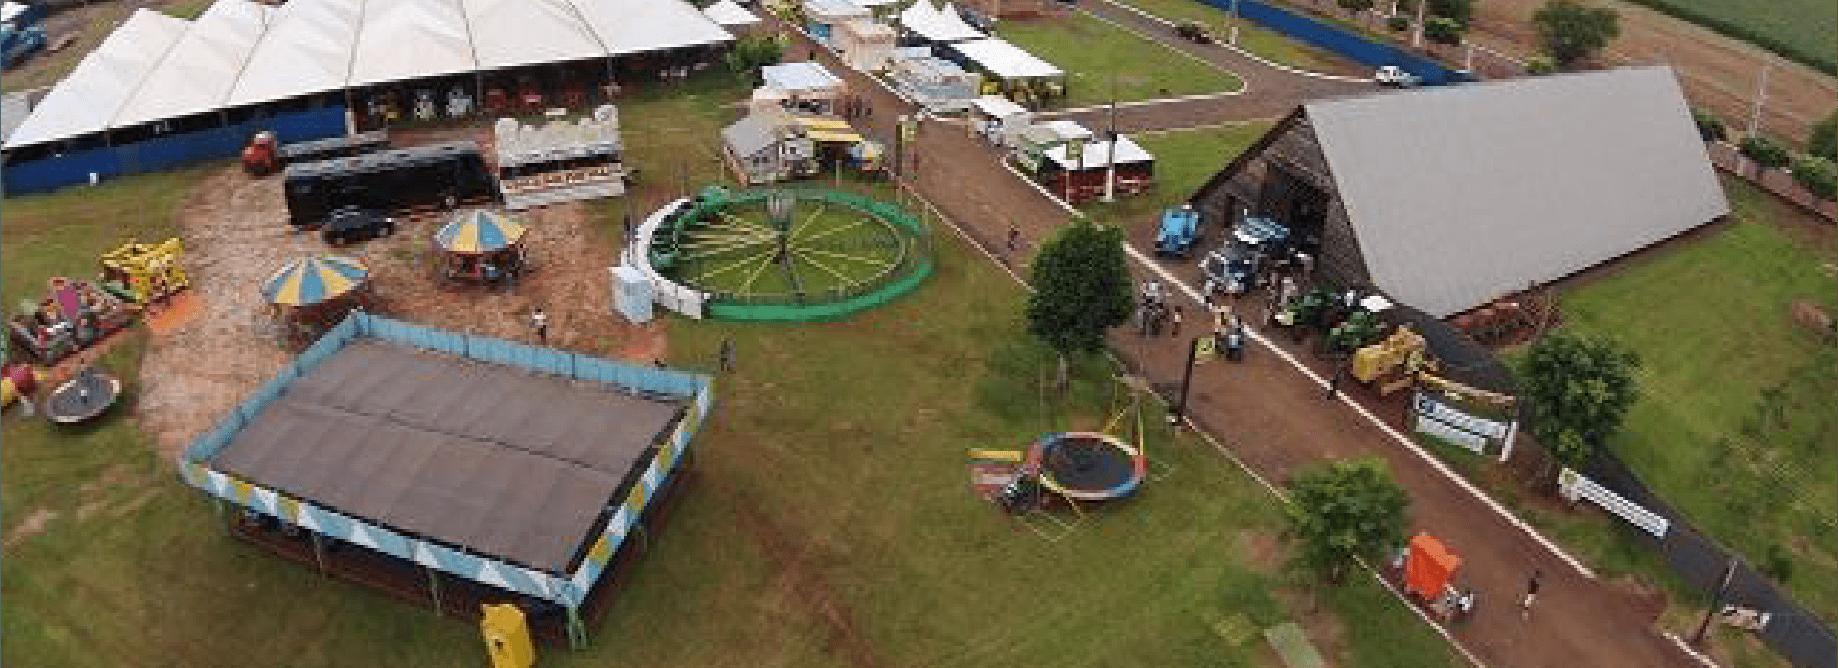 Vista aérea da Festa da Linguiça.